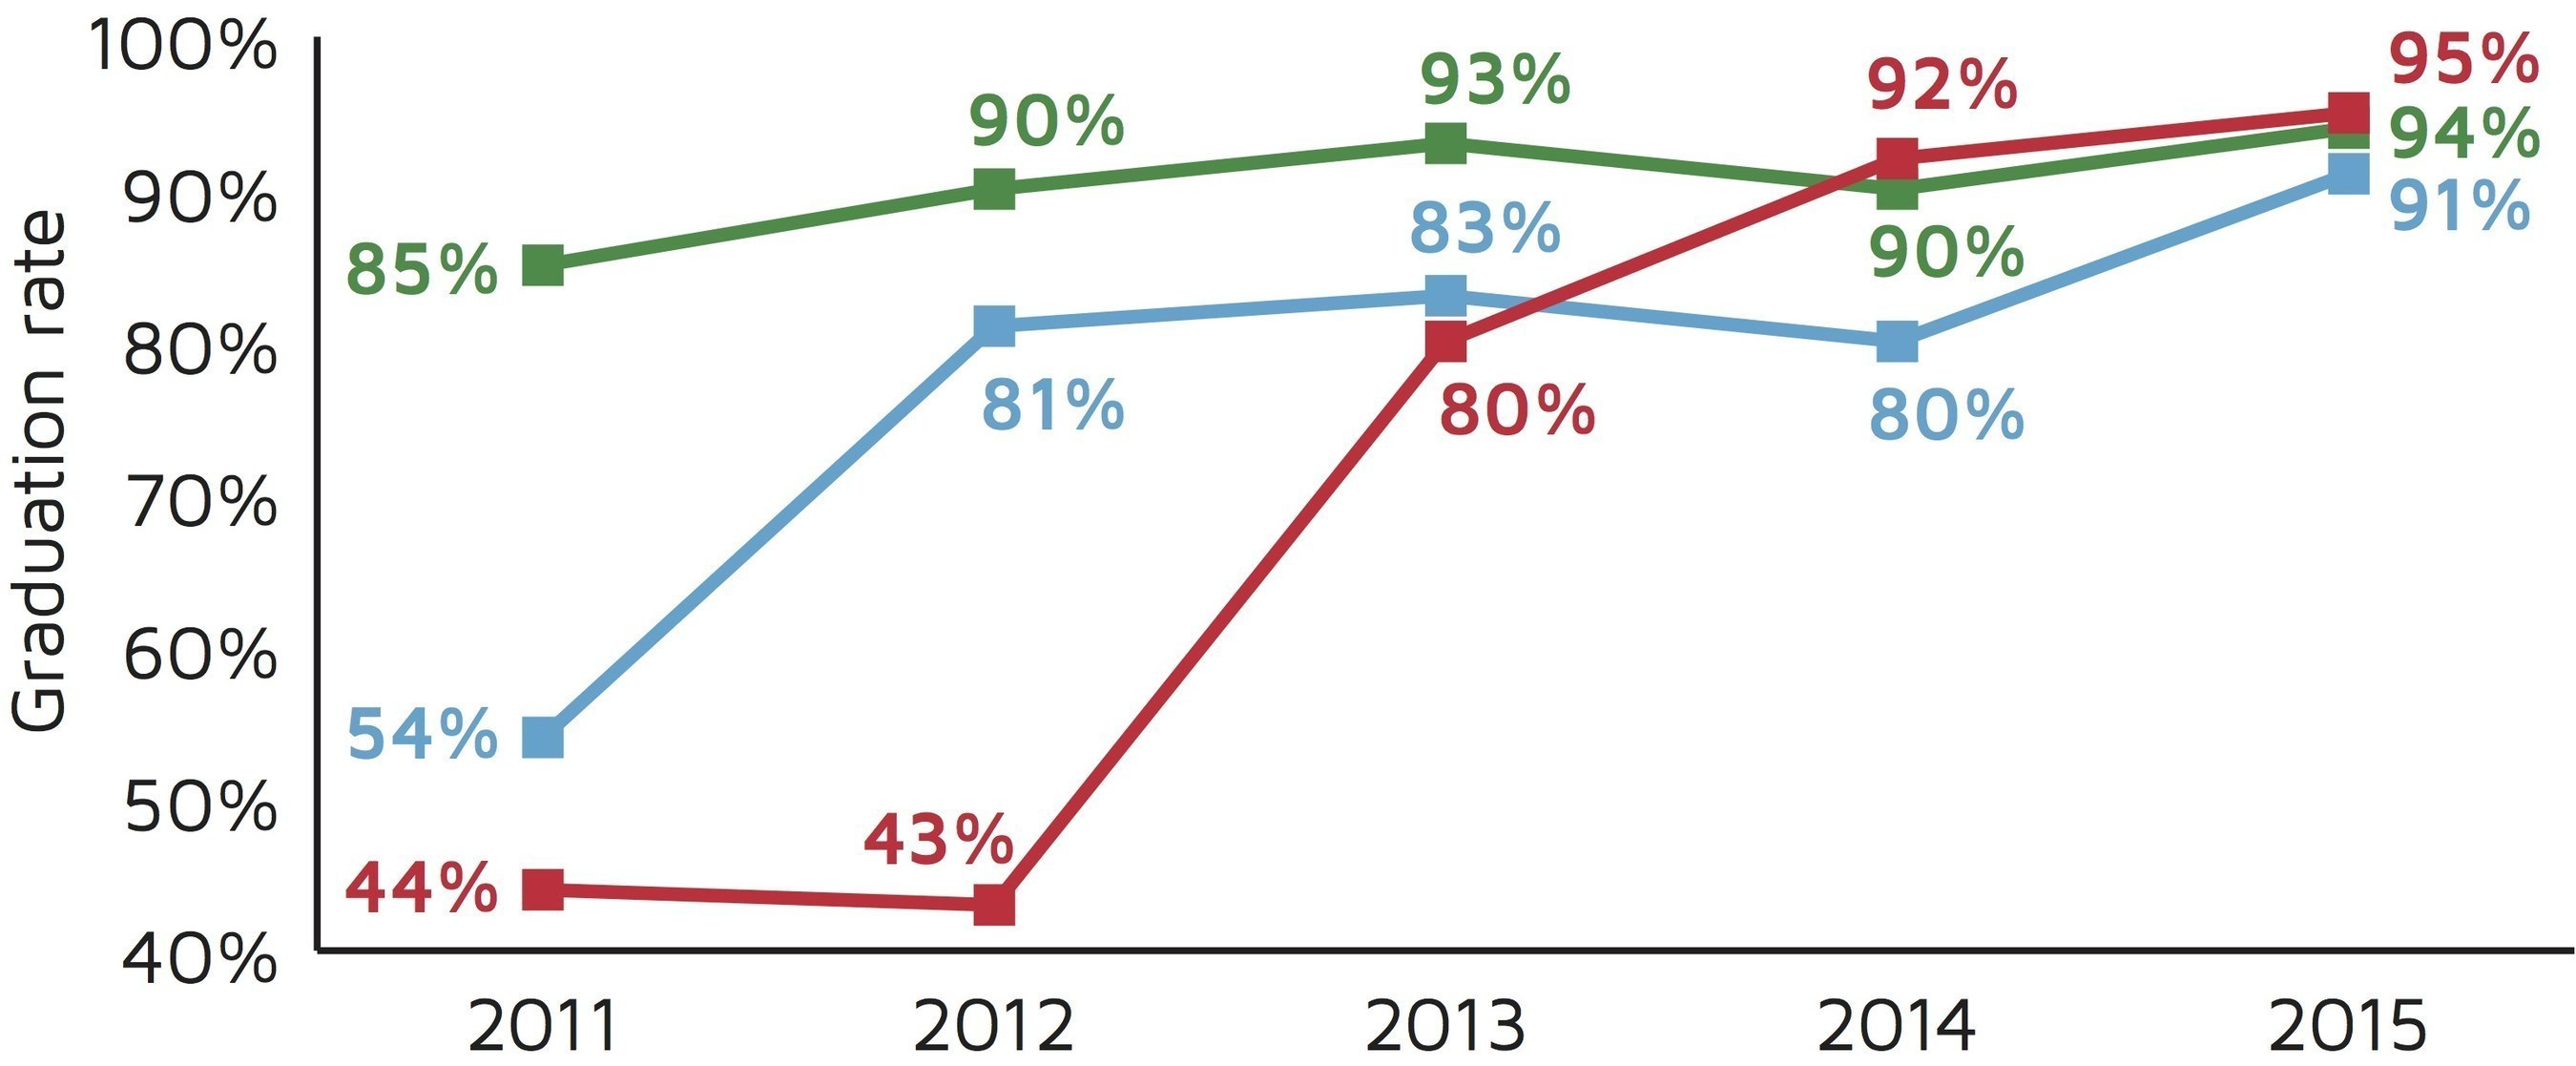 Graph 2: St. Louis Park Senior High Graduation Rate Trend. Source: Minnesota Department of Education (2016). Minnesota Report Card.